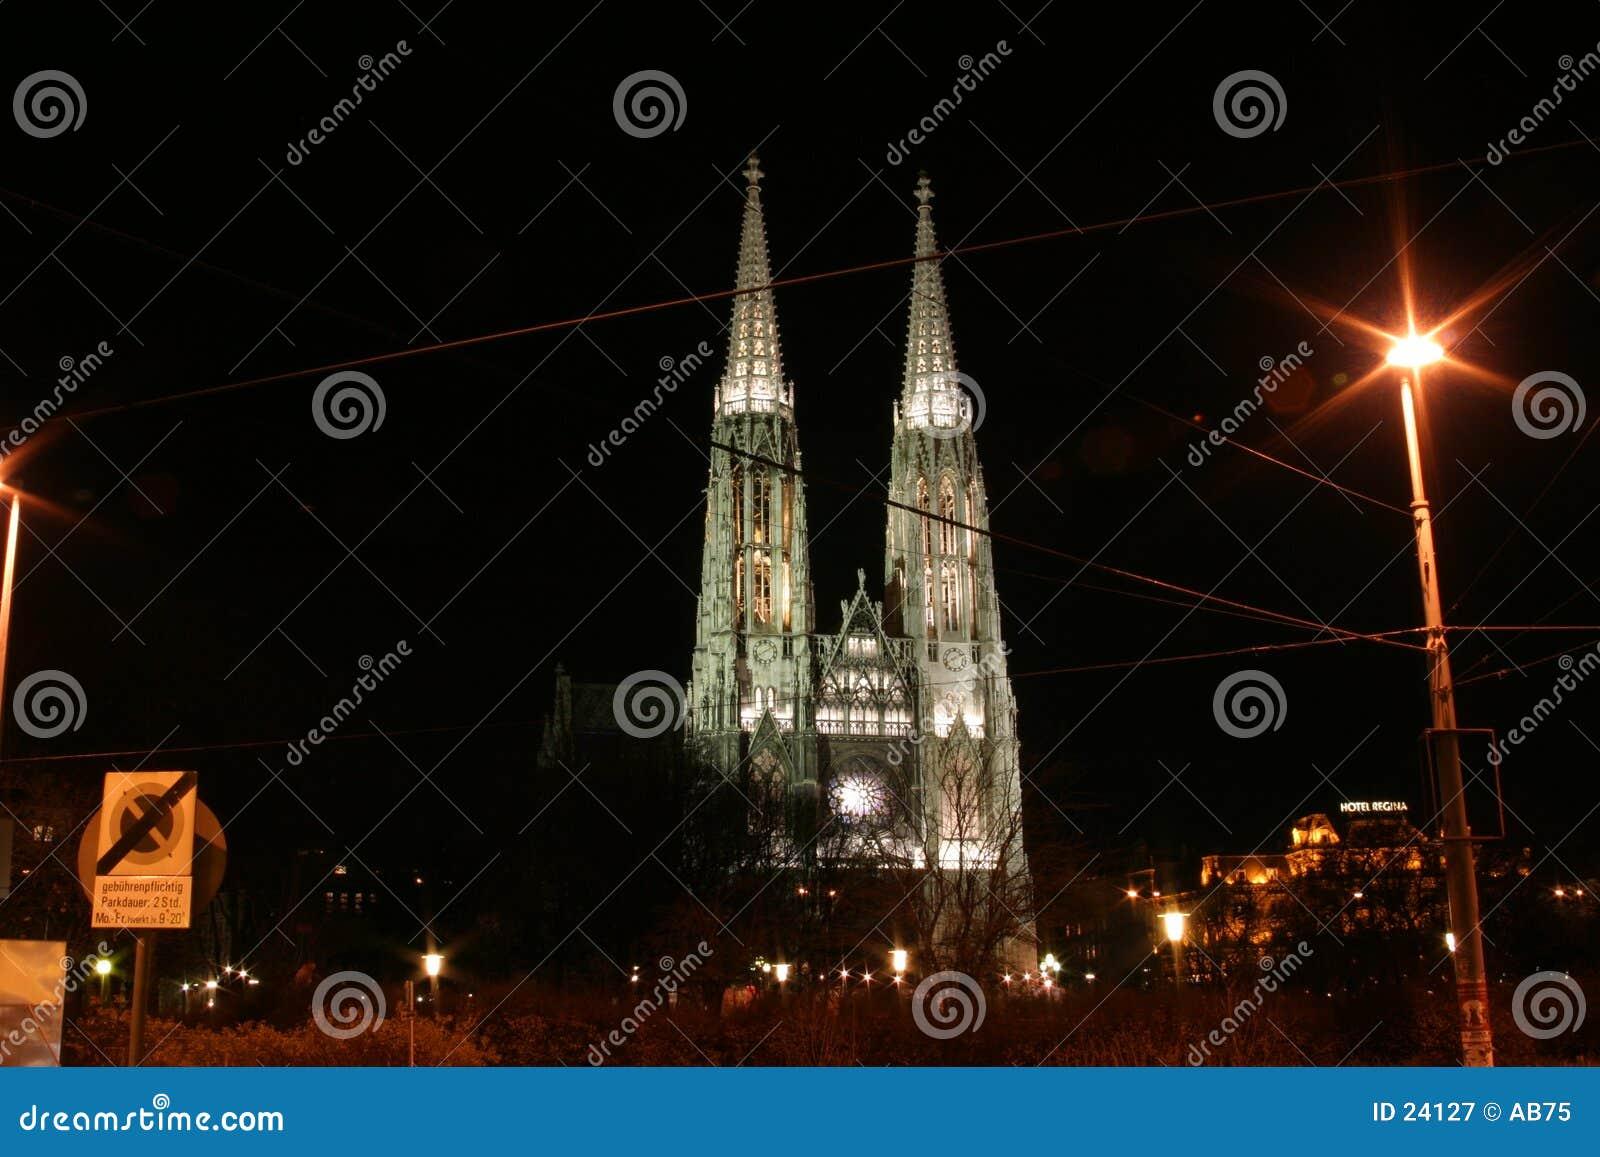 Kirche in Wien - Votiv Kirche